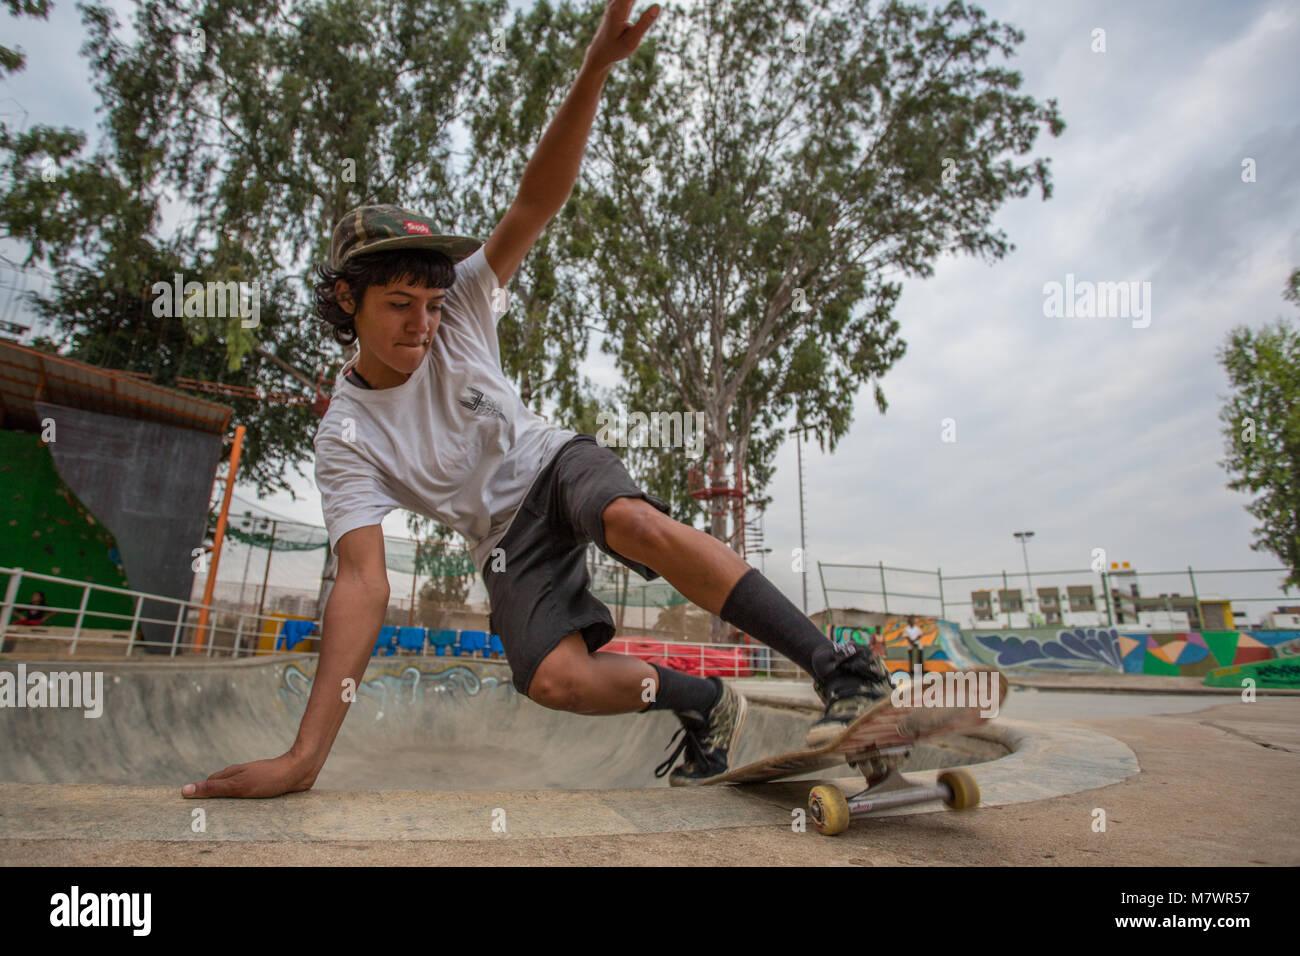 Atita Verghese, founder of Girl Skate India, skating in a park in Bangalore in 2015 - Stock Image